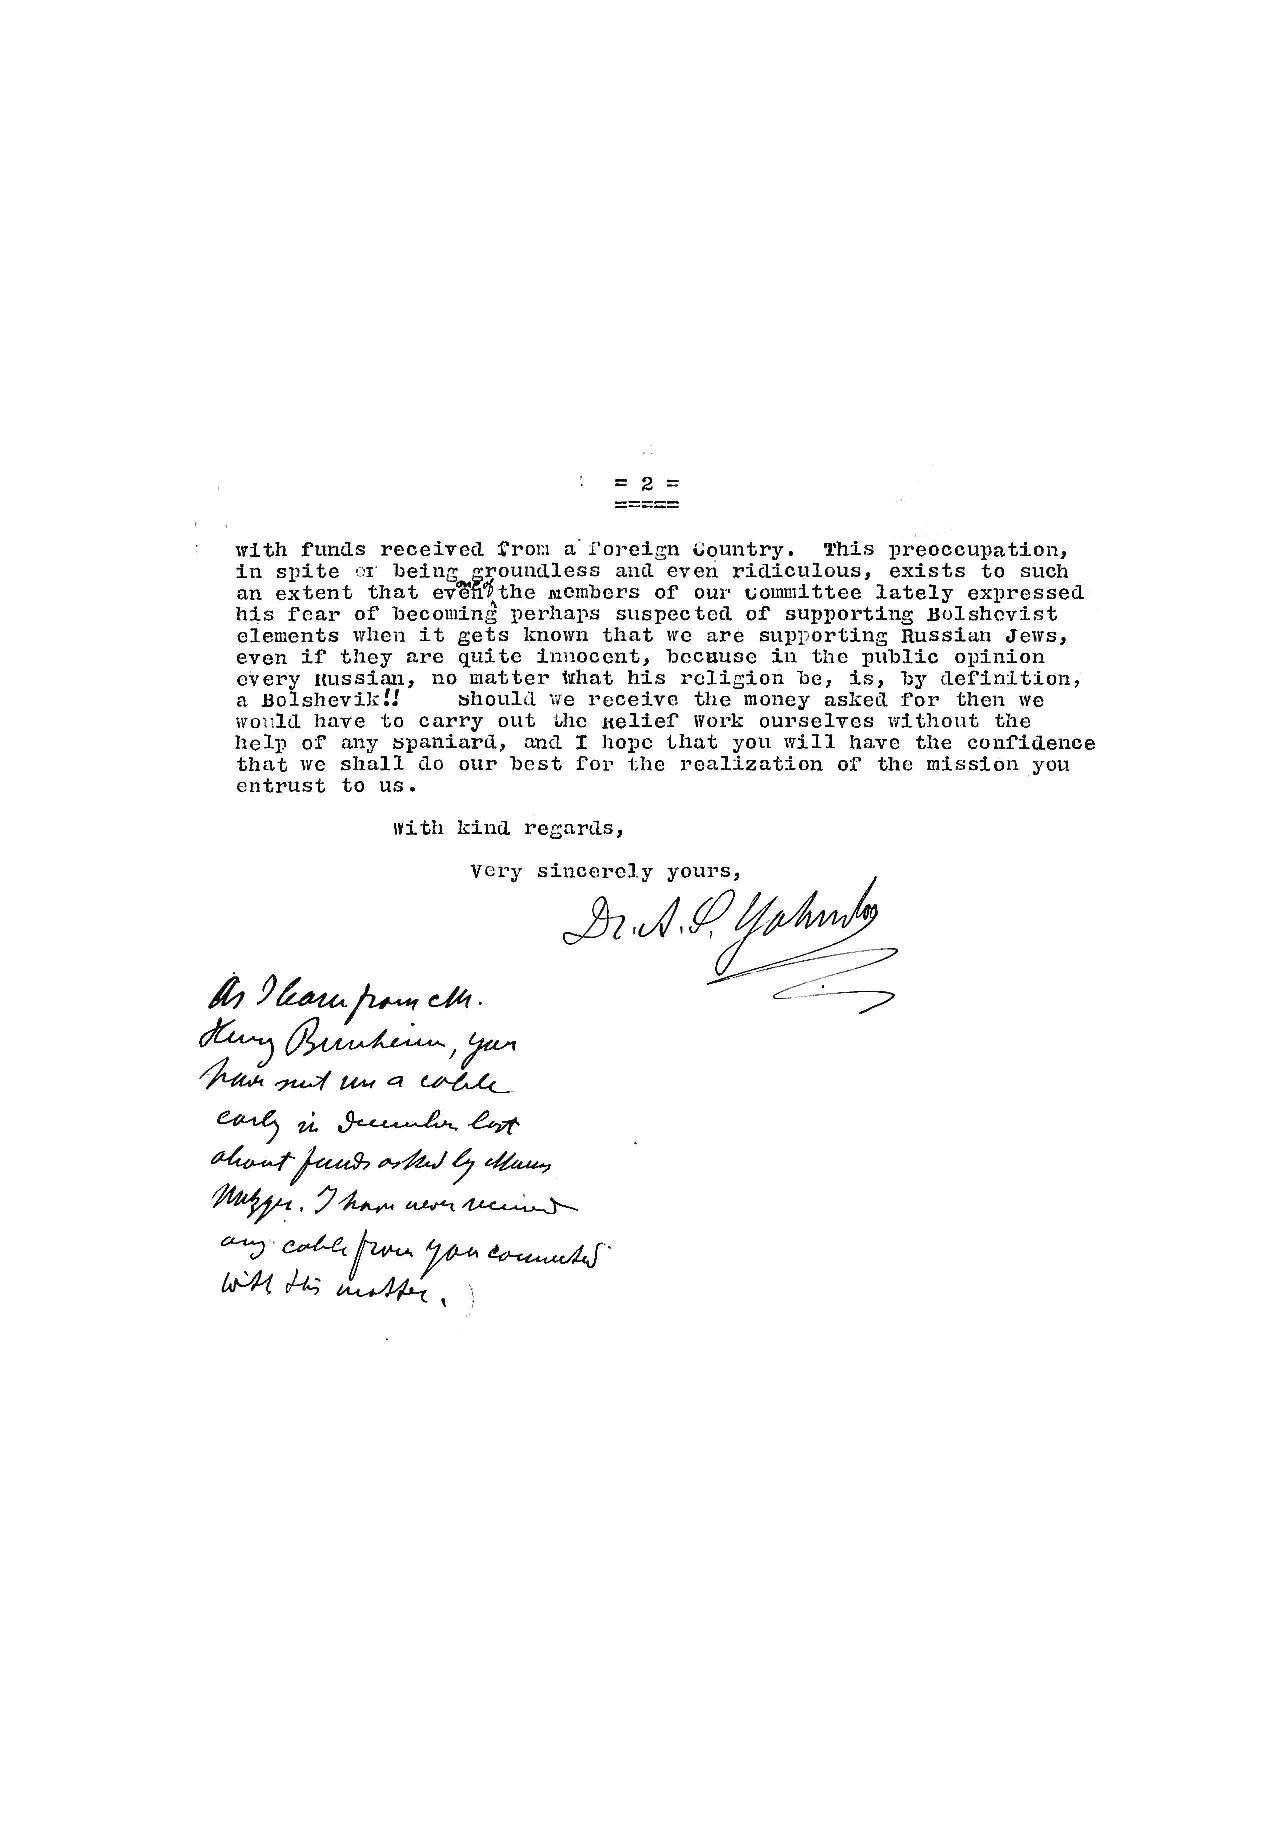 Carta d'Abraham Yahuda a Albert Lucas, secretari de l'American Joint Distribution Committee, 1919 | JDC Archives